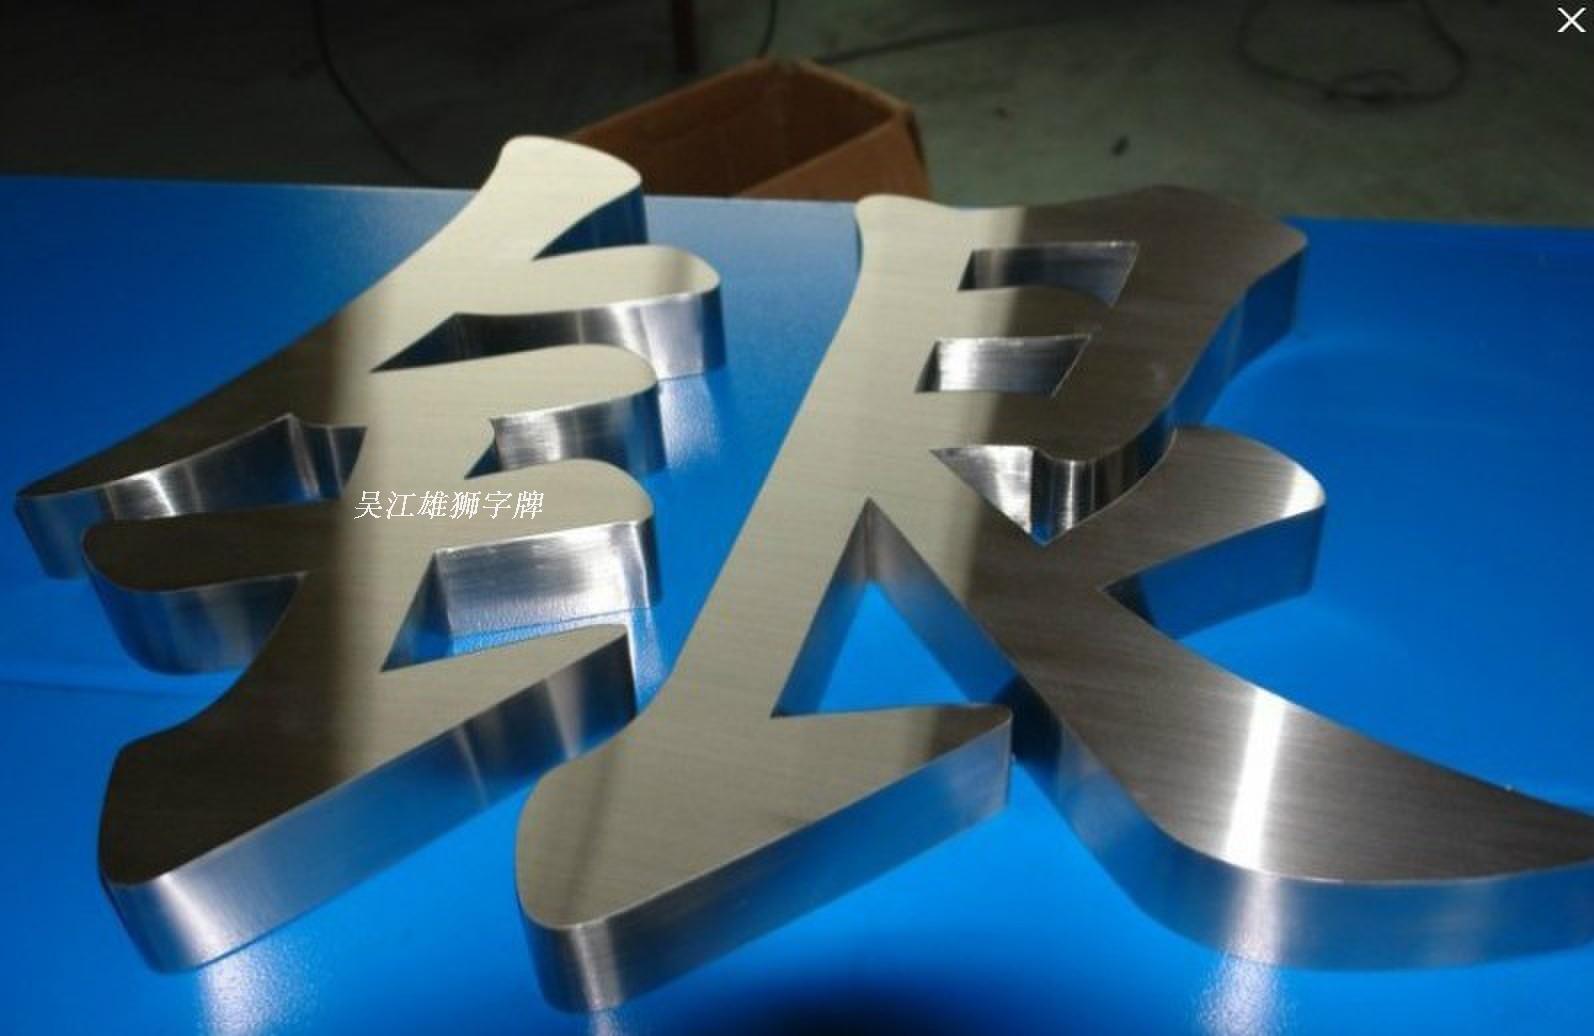 Stainless steel Seiko word stainless steel plate Wujiang lions white steel stainless steel mirror drawing word word word Tongzi